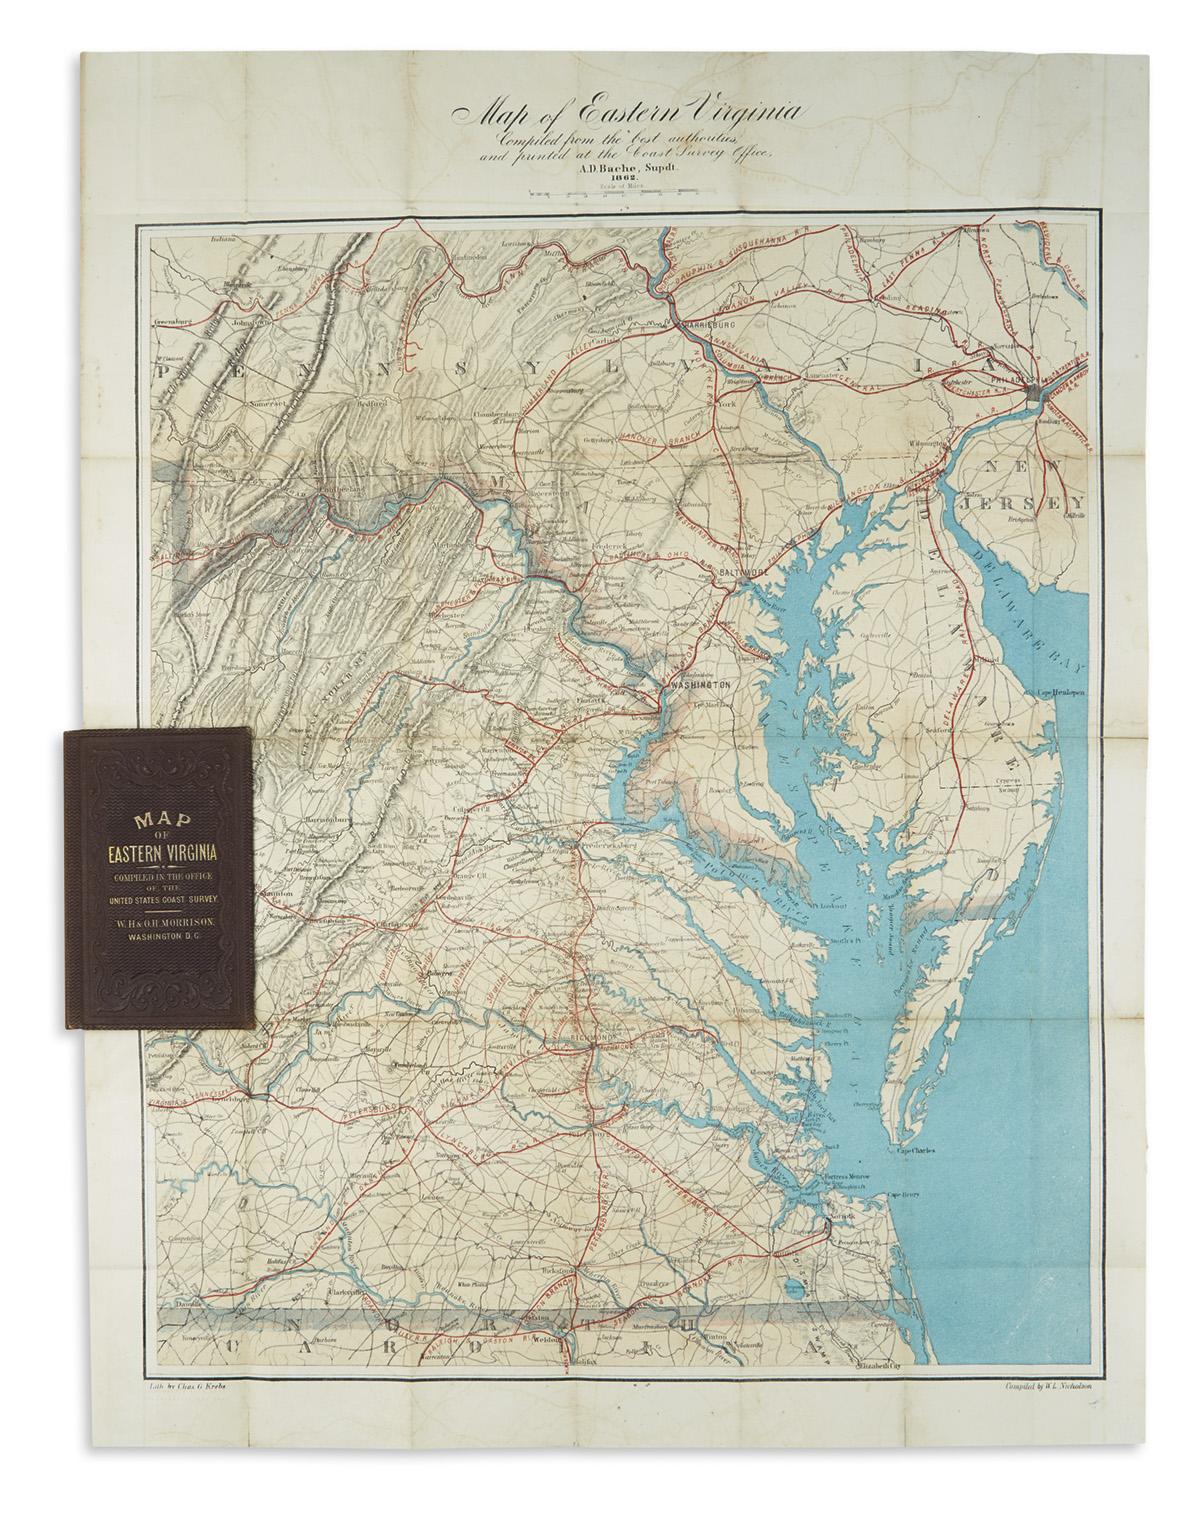 (CIVIL WAR.) U.S. Coast Survey; Nicholson, Walter L. (compiler.) Map of Eastern Virginia.